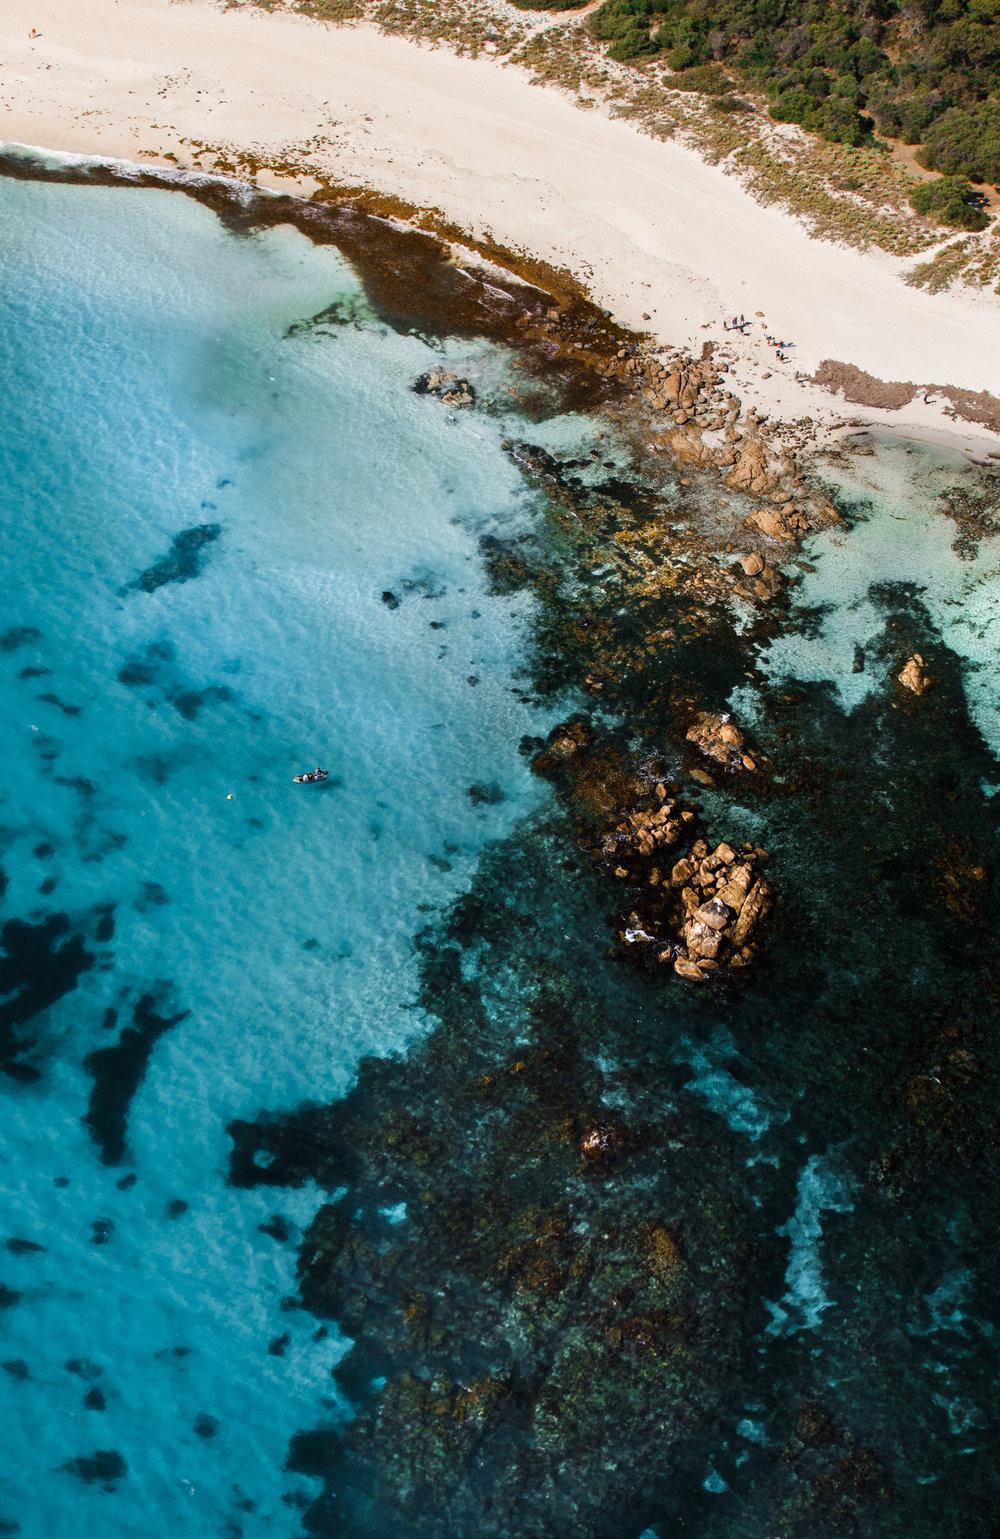 Samuel_Hesketh_Photography_Western_Australia-16.jpg